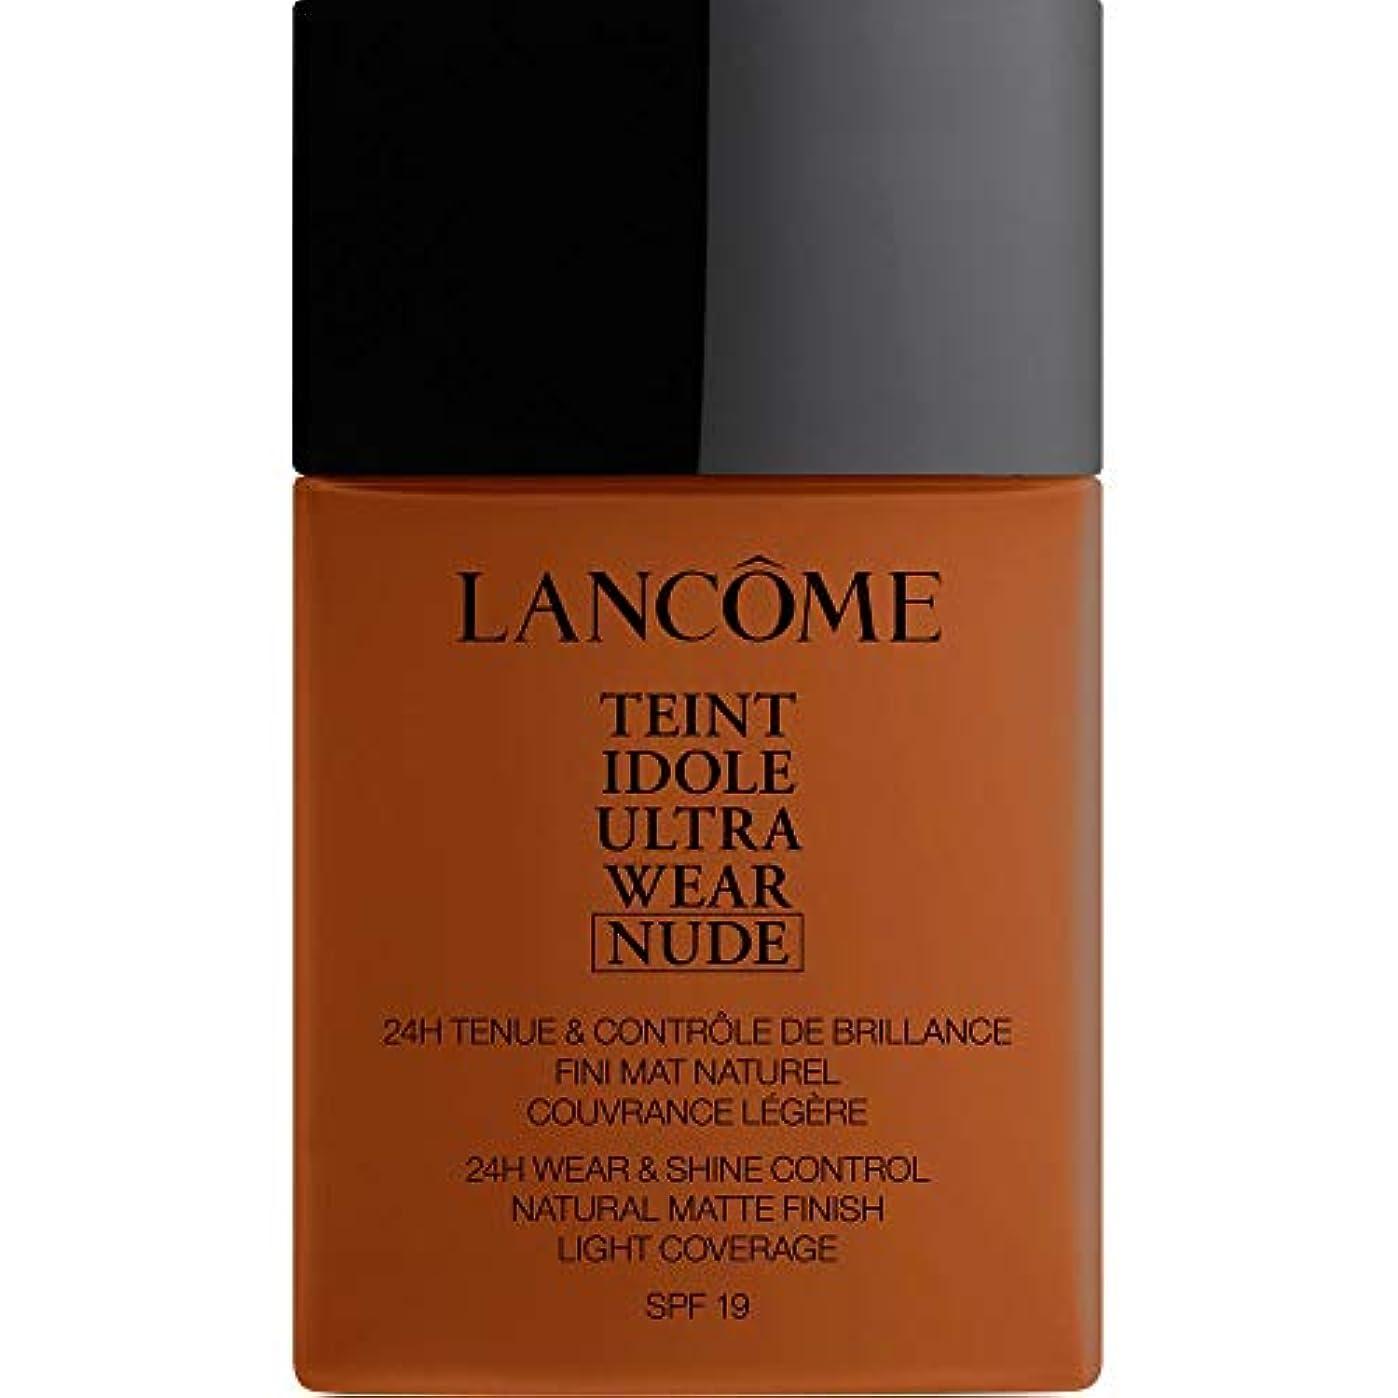 [Lanc?me ] ランコムTeintのIdole超摩耗ヌード財団Spf19の40ミリリットル13.2 - ブラン - Lancome Teint Idole Ultra Wear Nude Foundation SPF19...